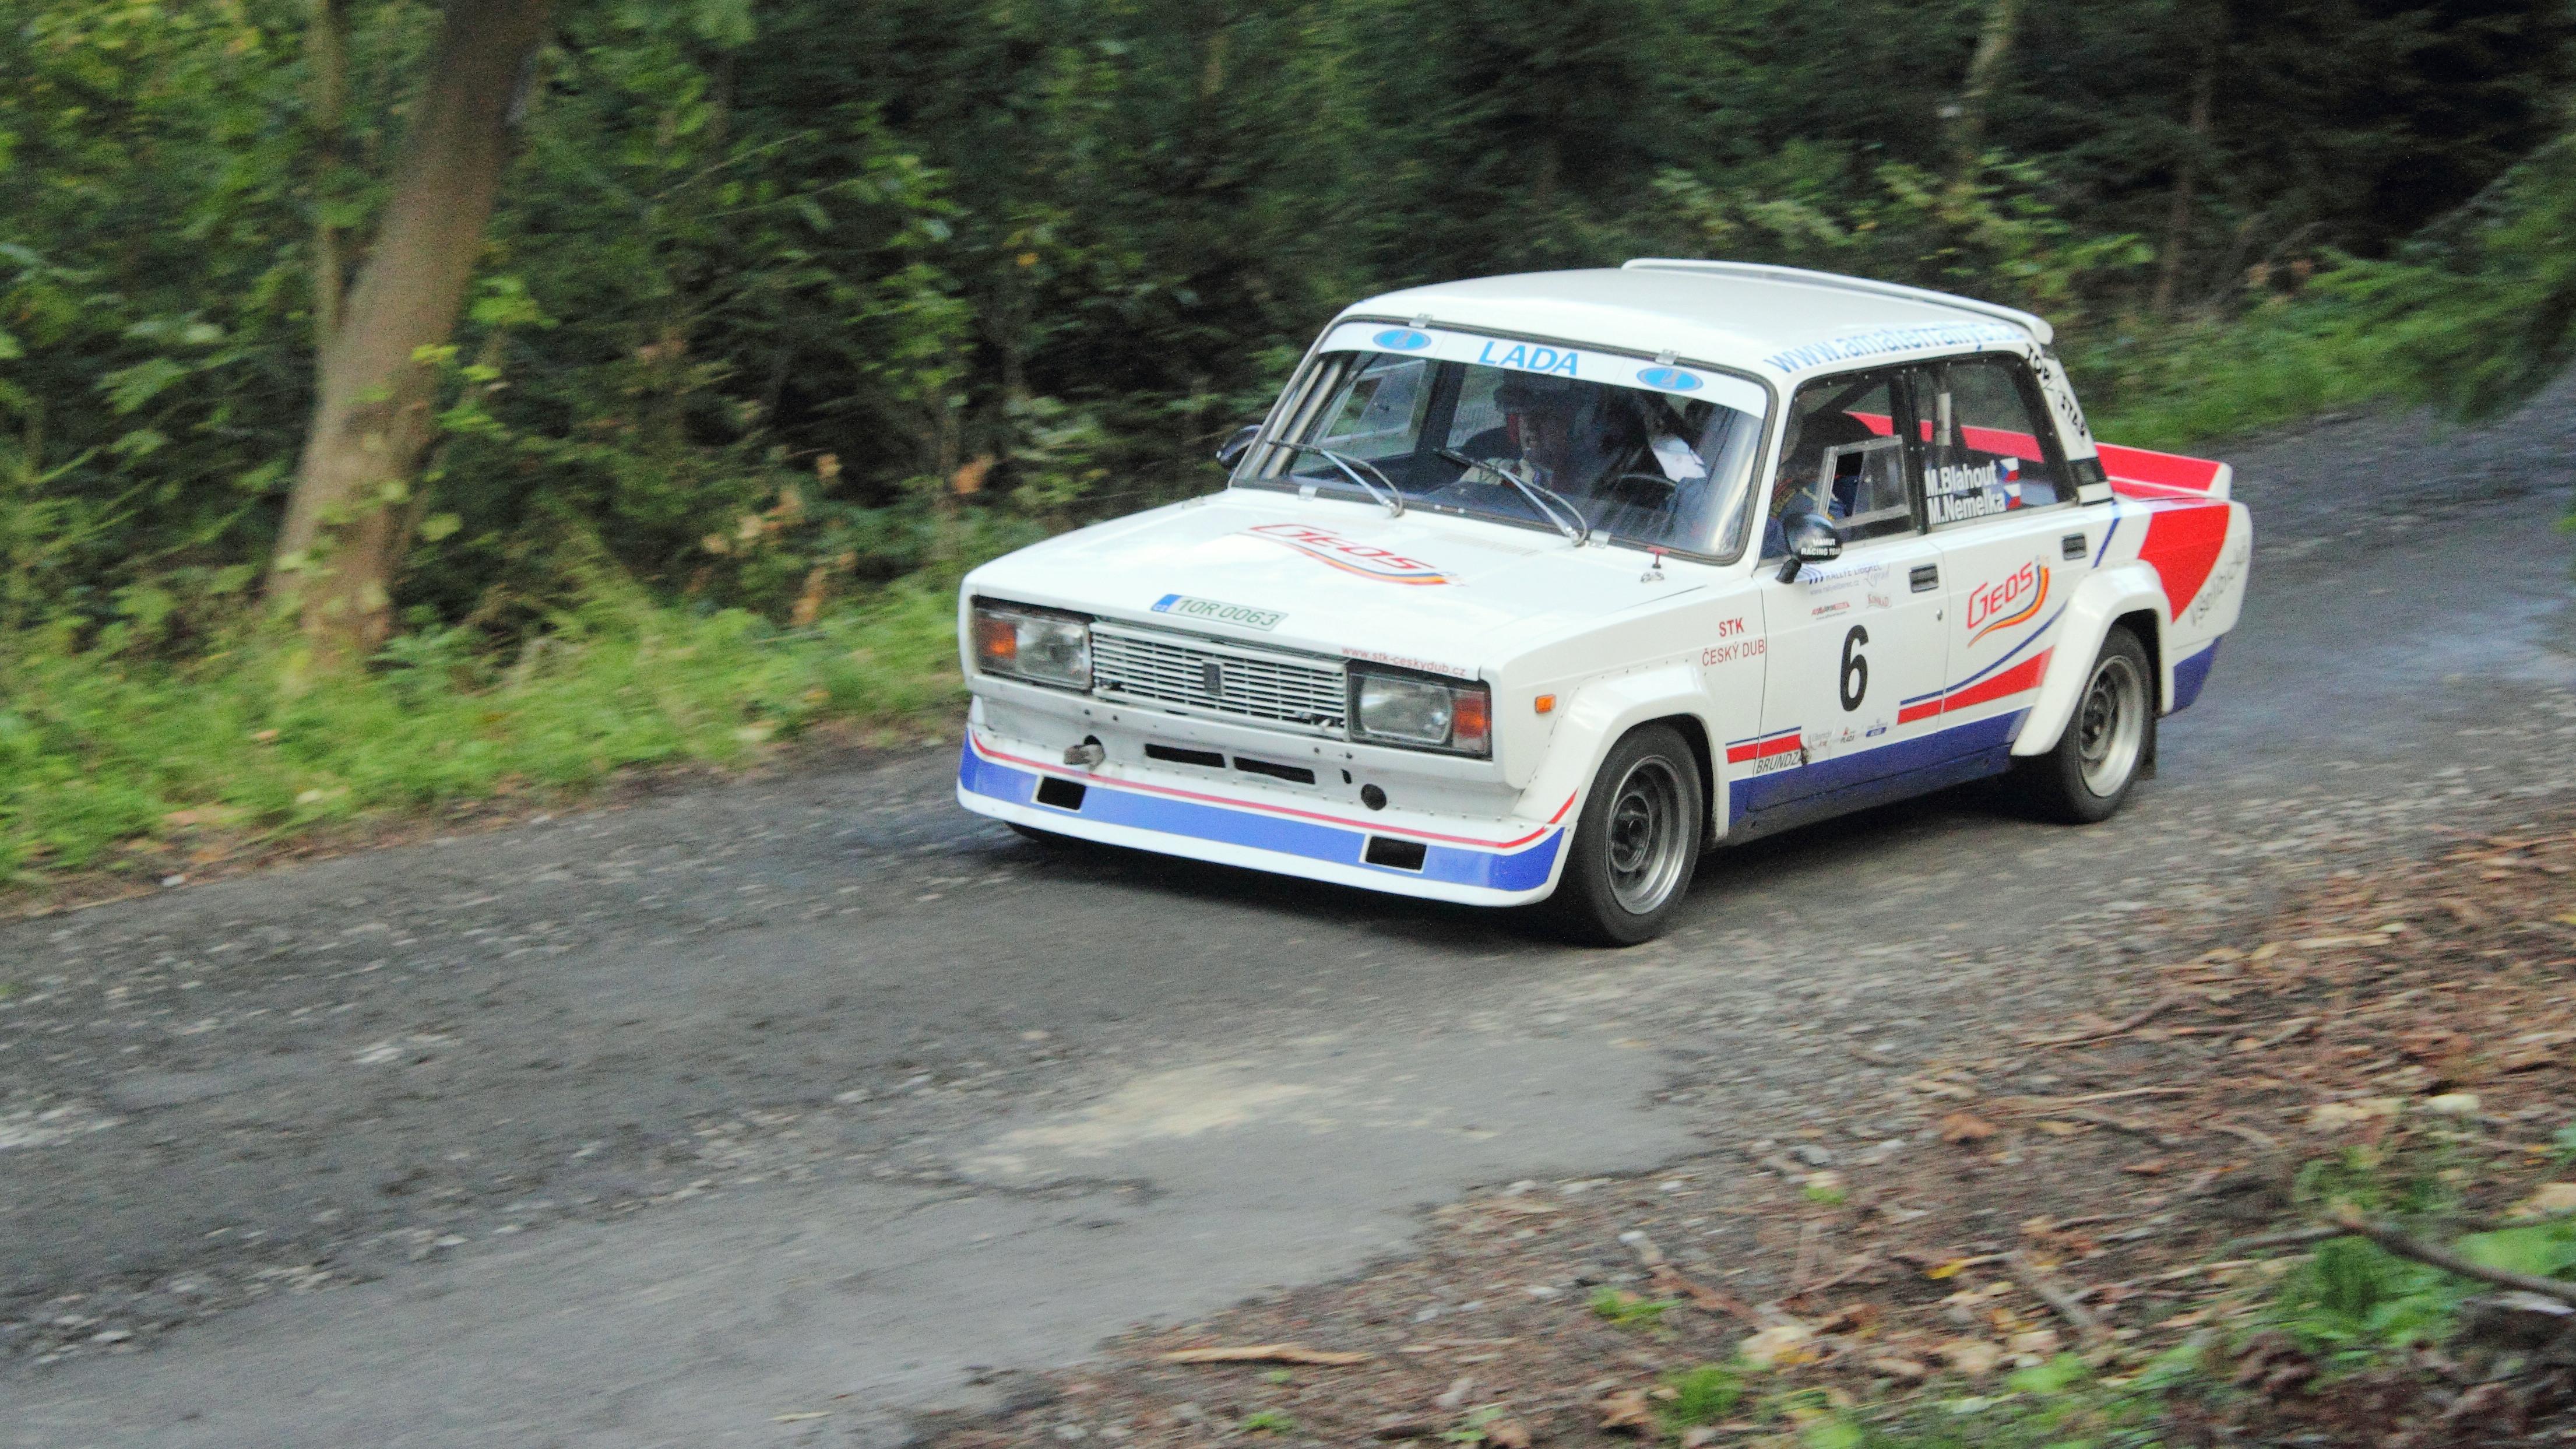 File Rallye Legend Liberec 2013 Lada Vaz 2105 Vfts 6